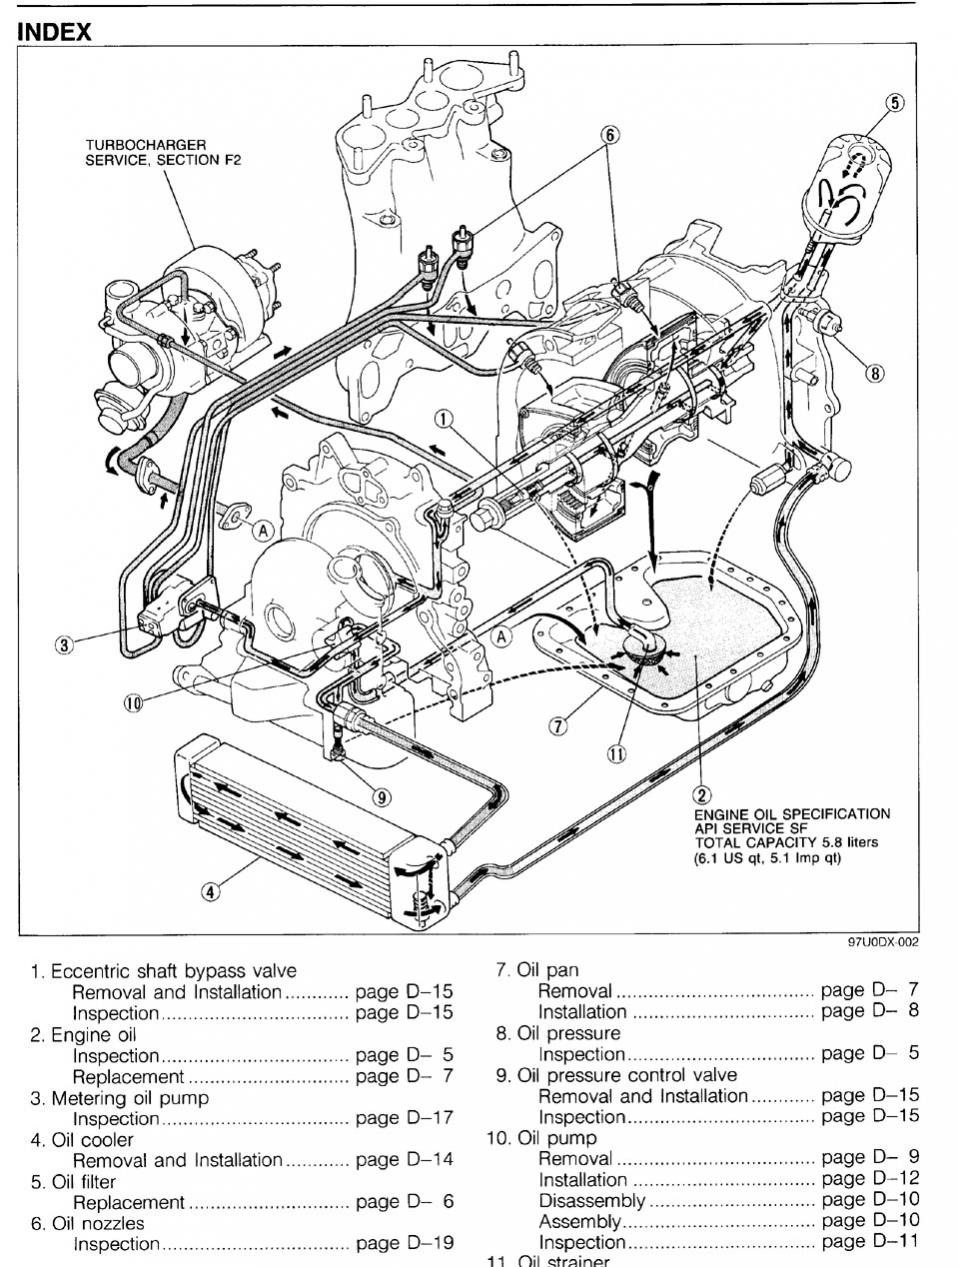 hight resolution of external oil line line loop oil modification rx7club com mazda rh rx7club com rx 8 oil line diagram jeep grand cherokee diagrams